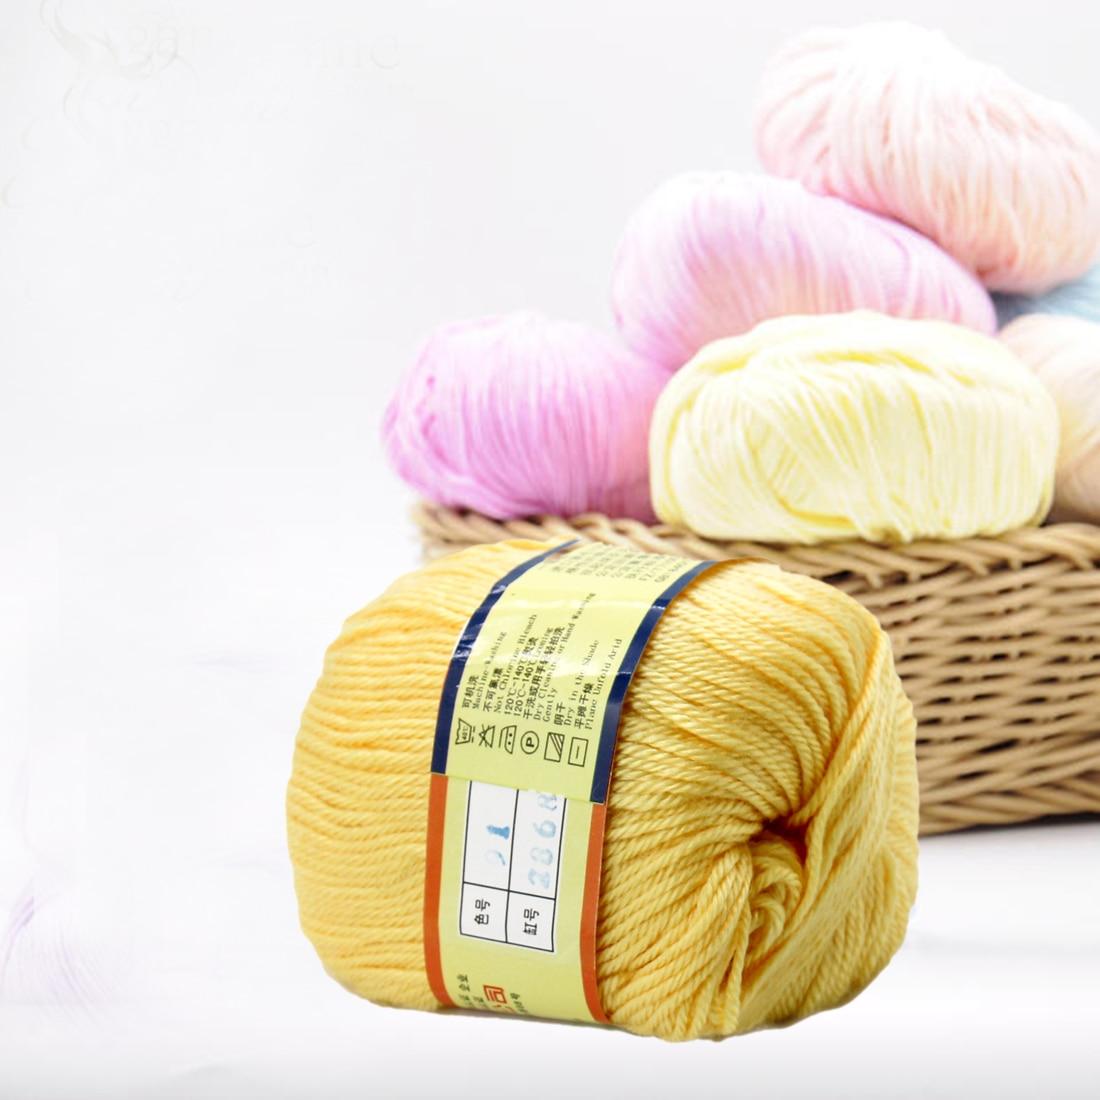 1pc 50g Cotton Knitting Yarn Crochet Yarn For Knitting